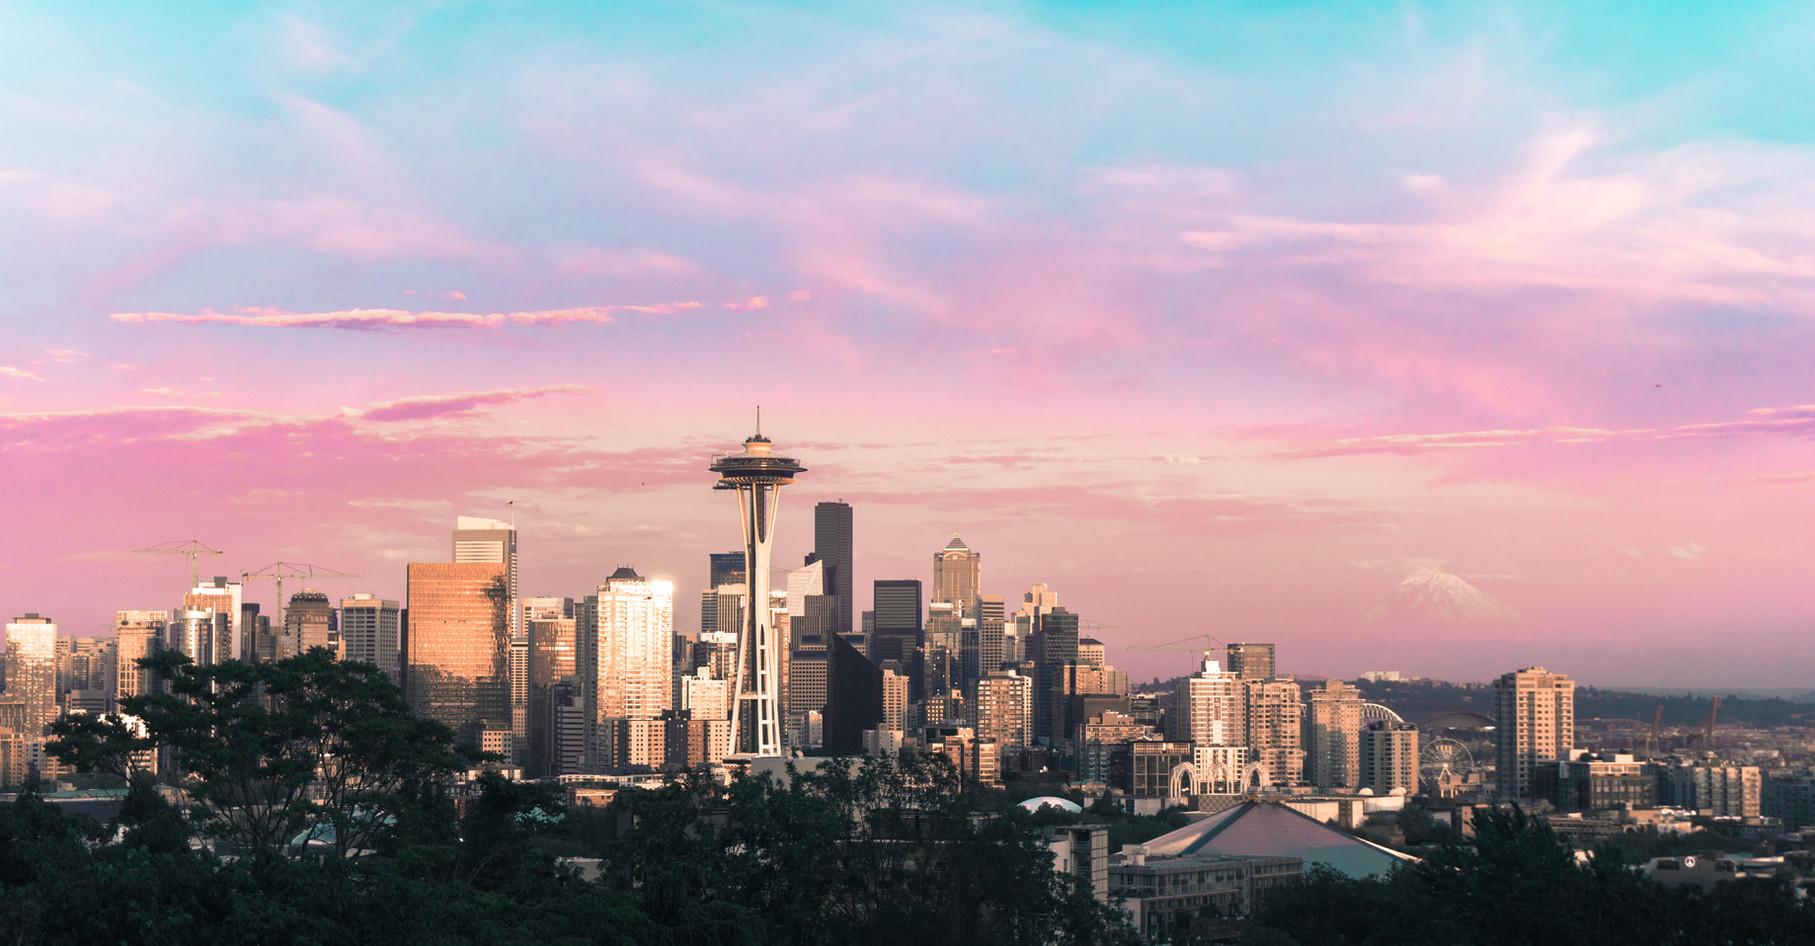 Seattle Data Center MarketBeat Report - Fall 2019